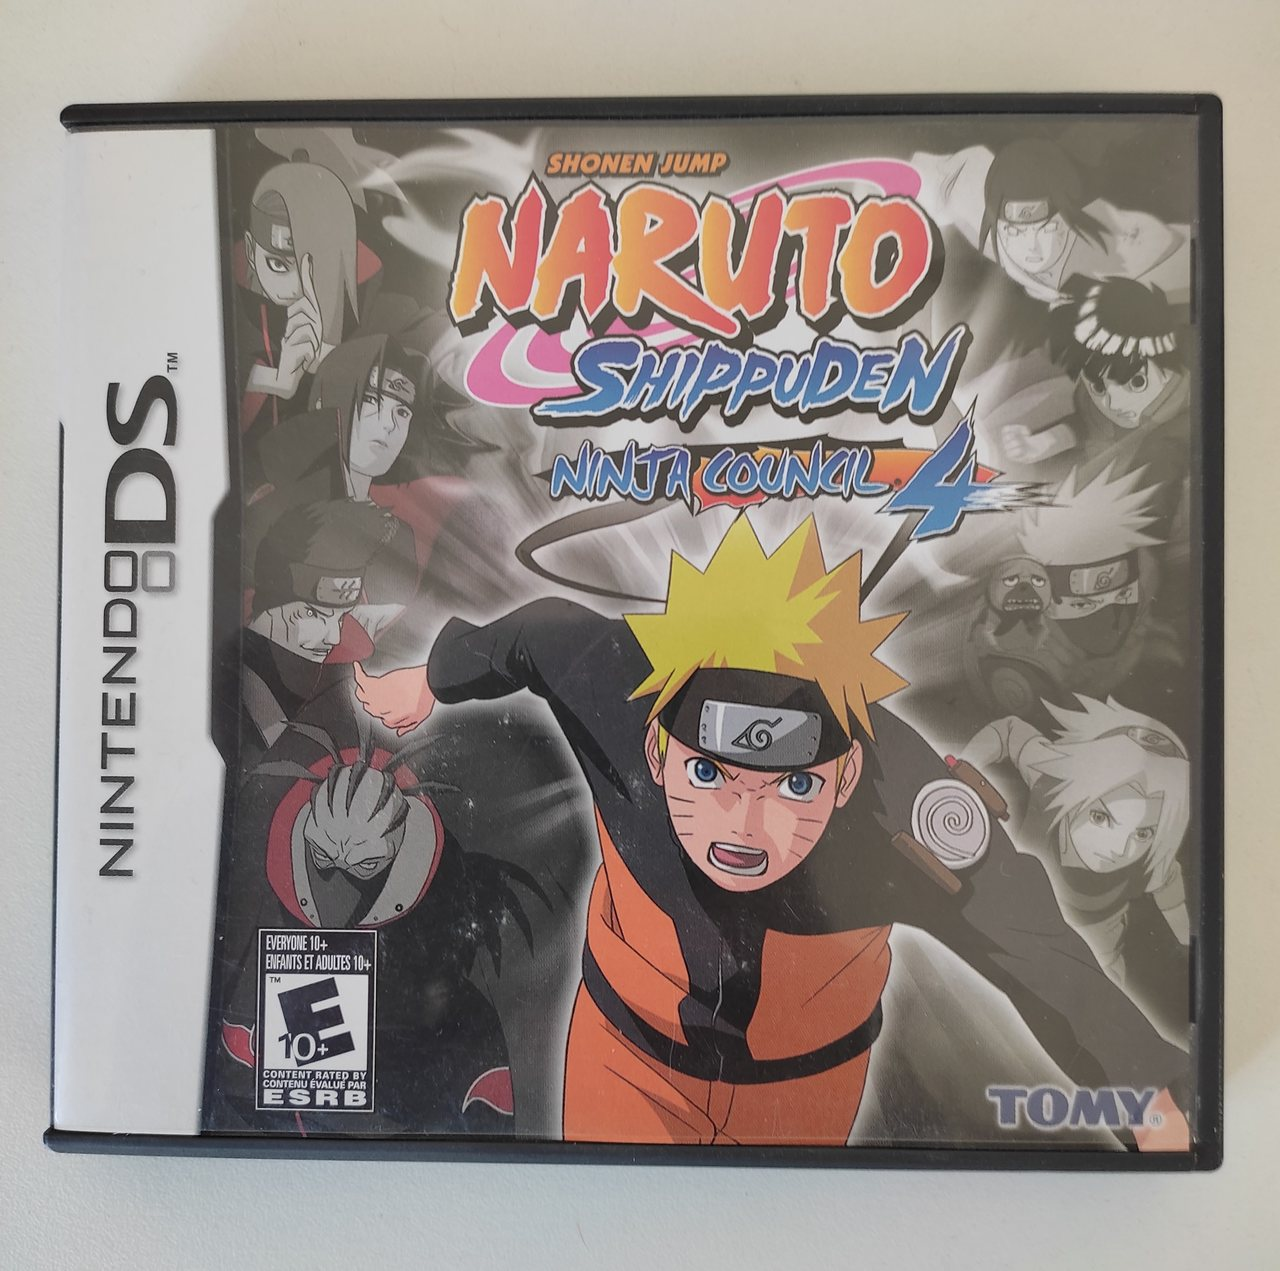 Naruto Shippuden Ninja Council 4 - Nintendo DS - Usado